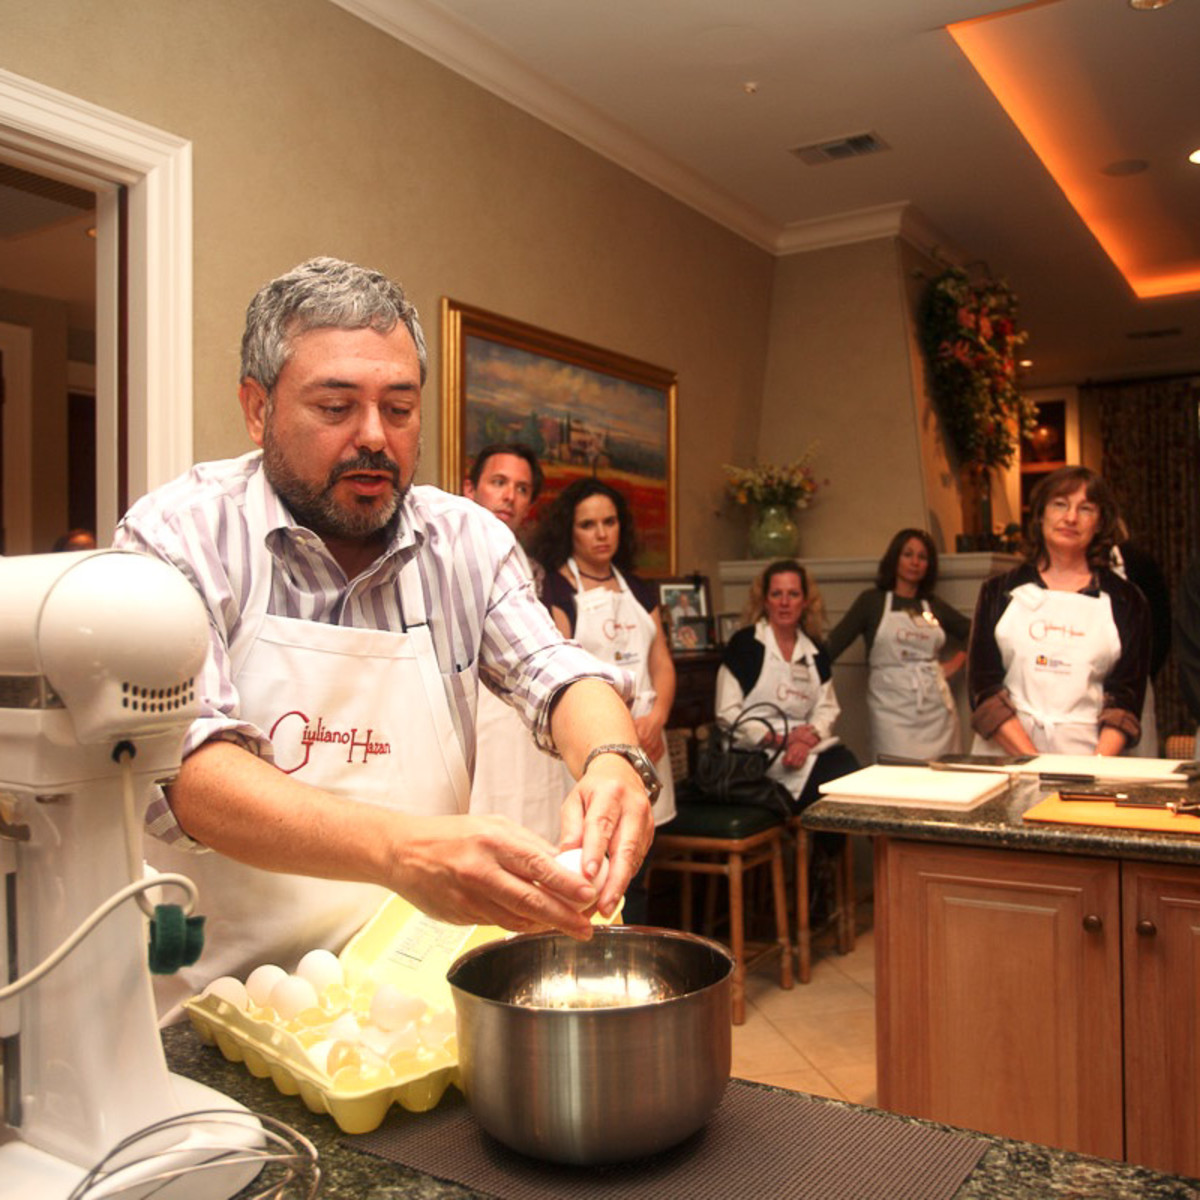 News_Chef Giuliano Hazan_cracking eggs